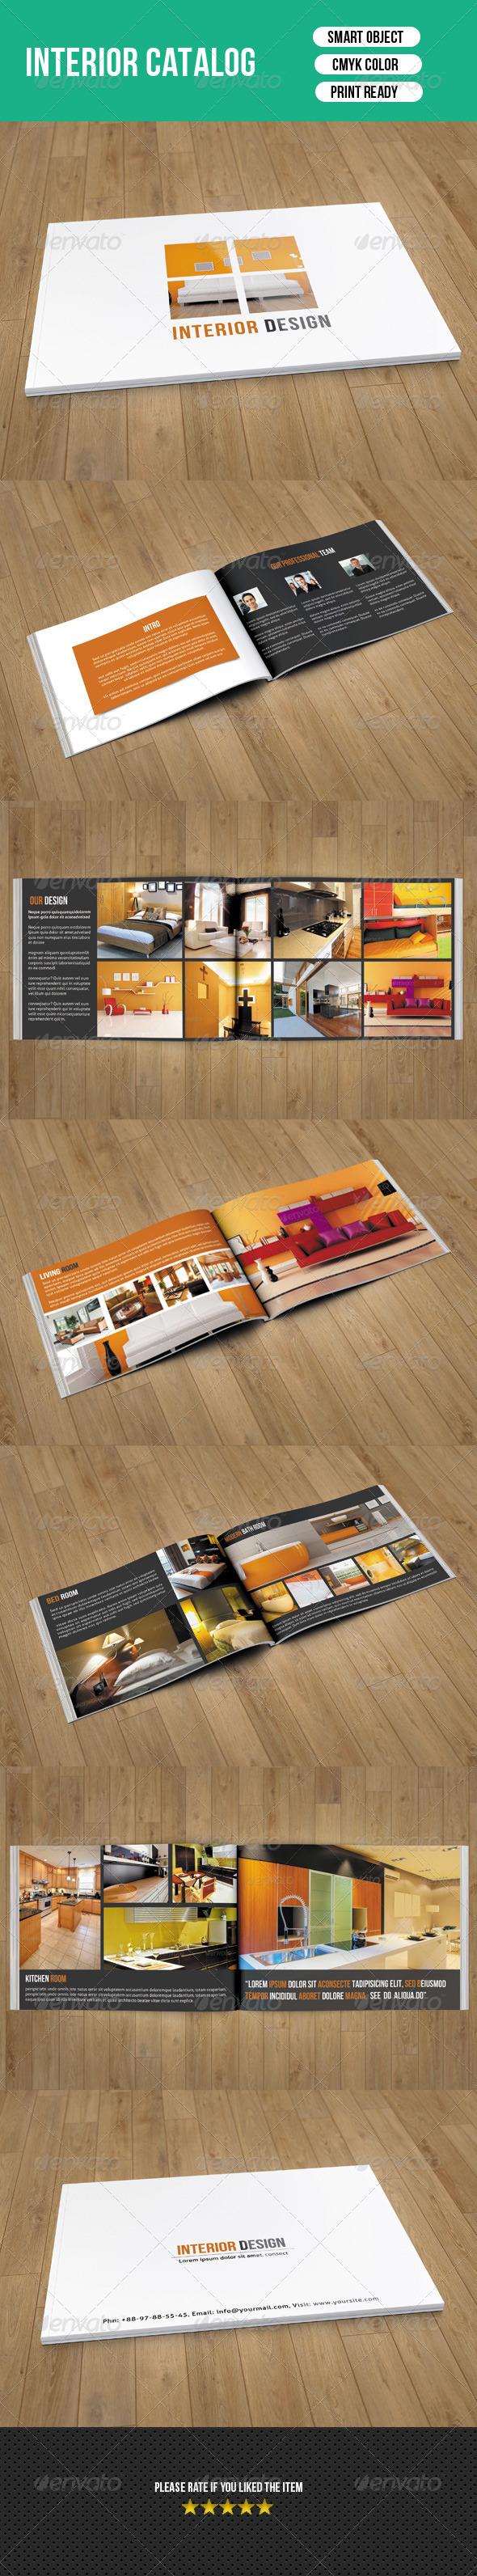 GraphicRiver Interior Catalog 7634492